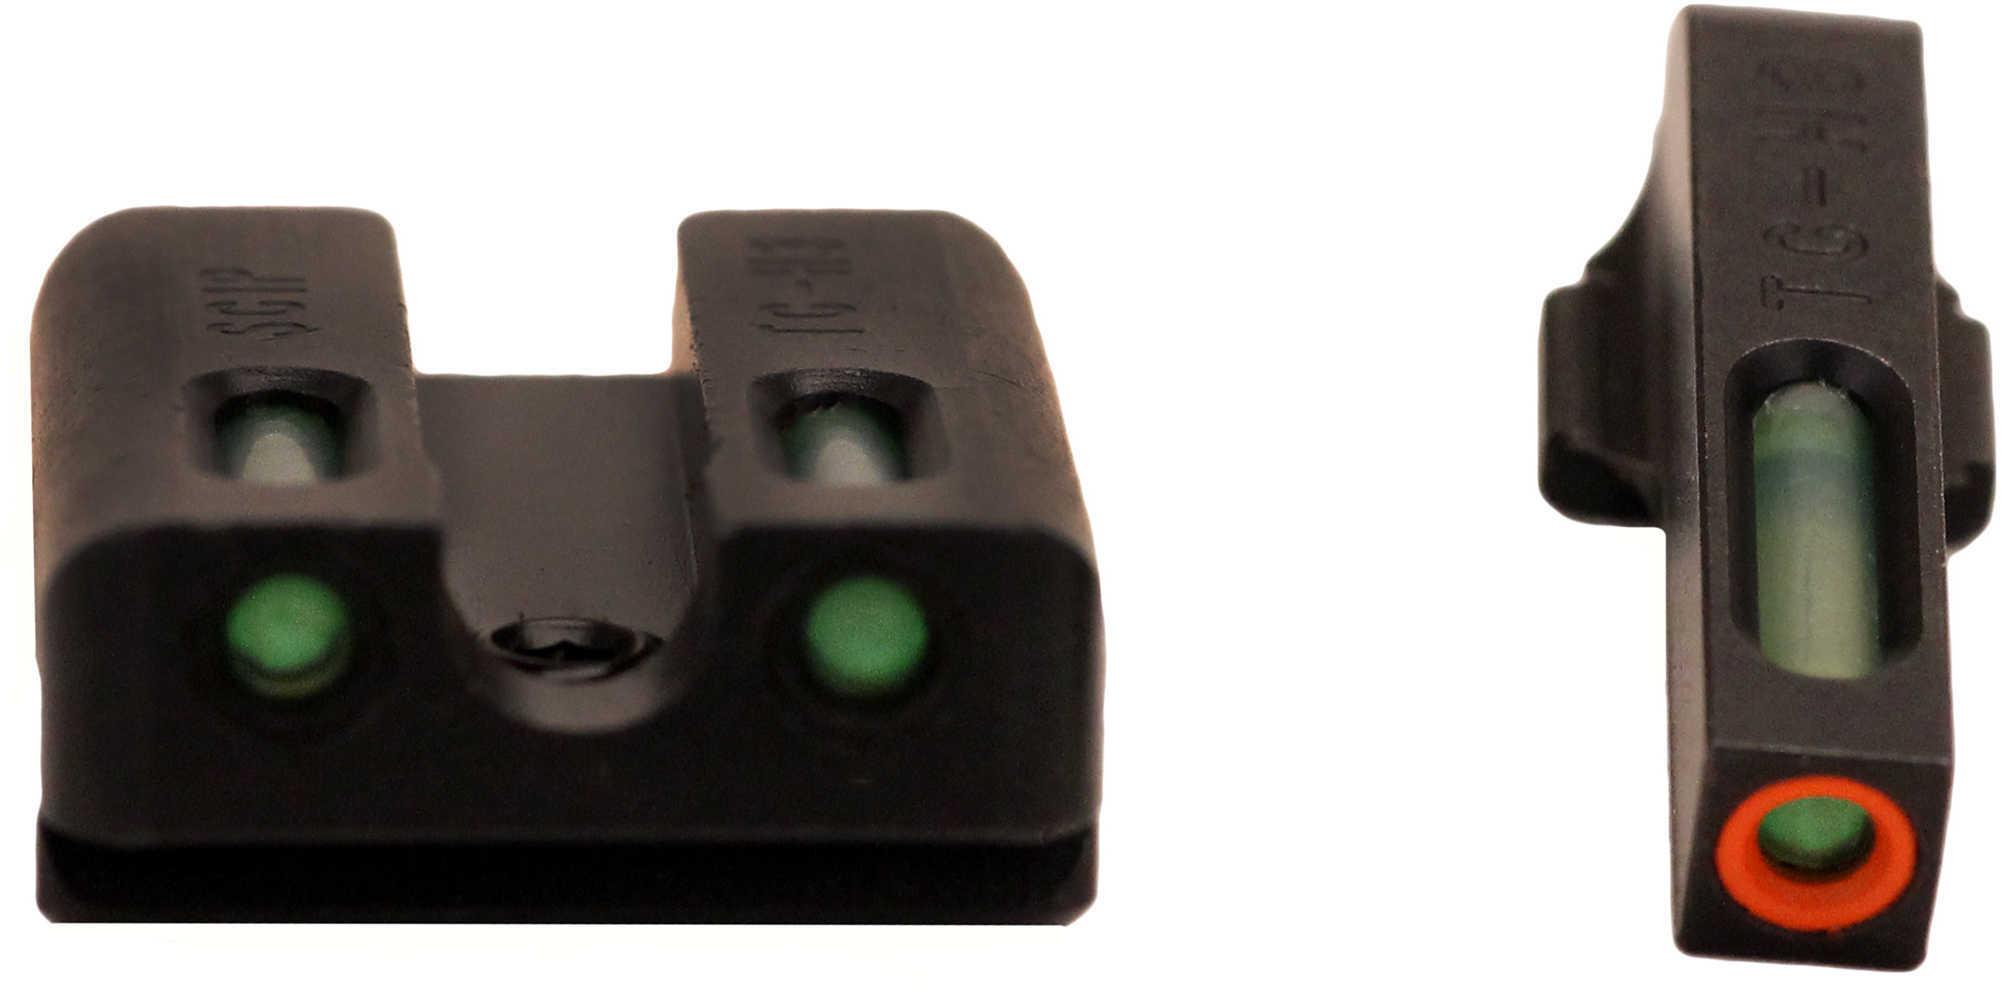 Truglo Brite-Site TFX Pro Sight Fits Sig #8 Front/#8 Rear Tritium/Fiber-Optic Day/Night Sight 24/7 Brightness Orange Rin